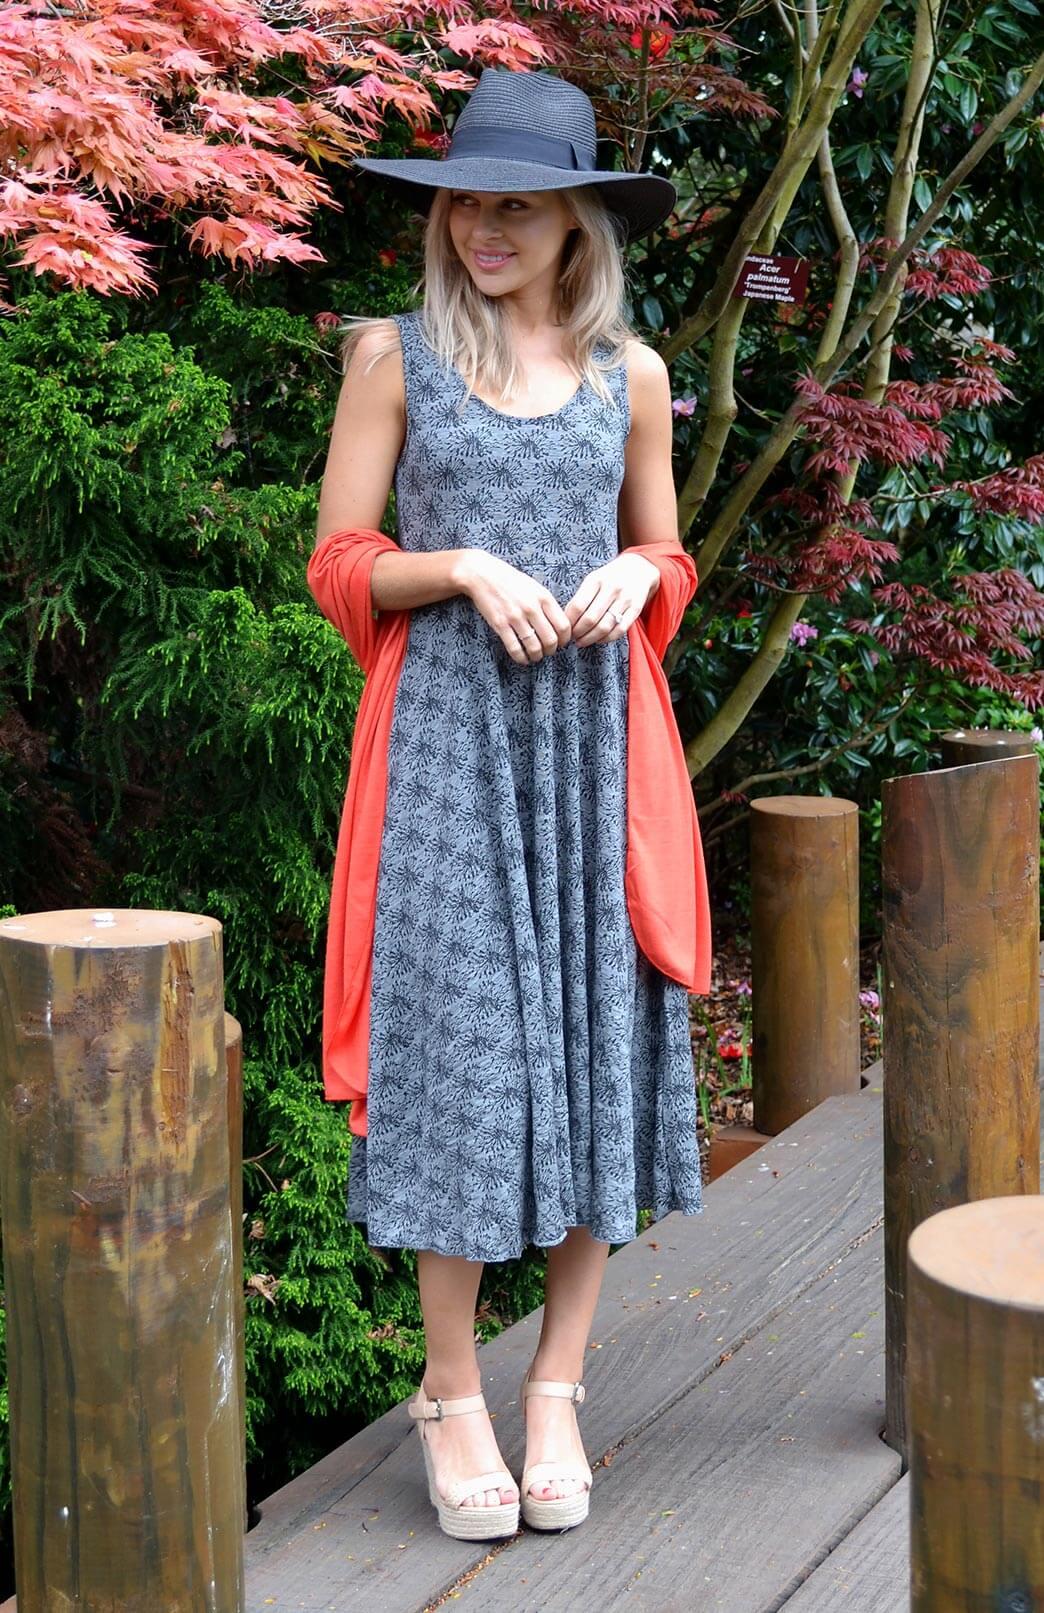 Fan Dress - Women's Black & Grey Floral Wool Sleeveless Spring Dress - Smitten Merino Tasmania Australia